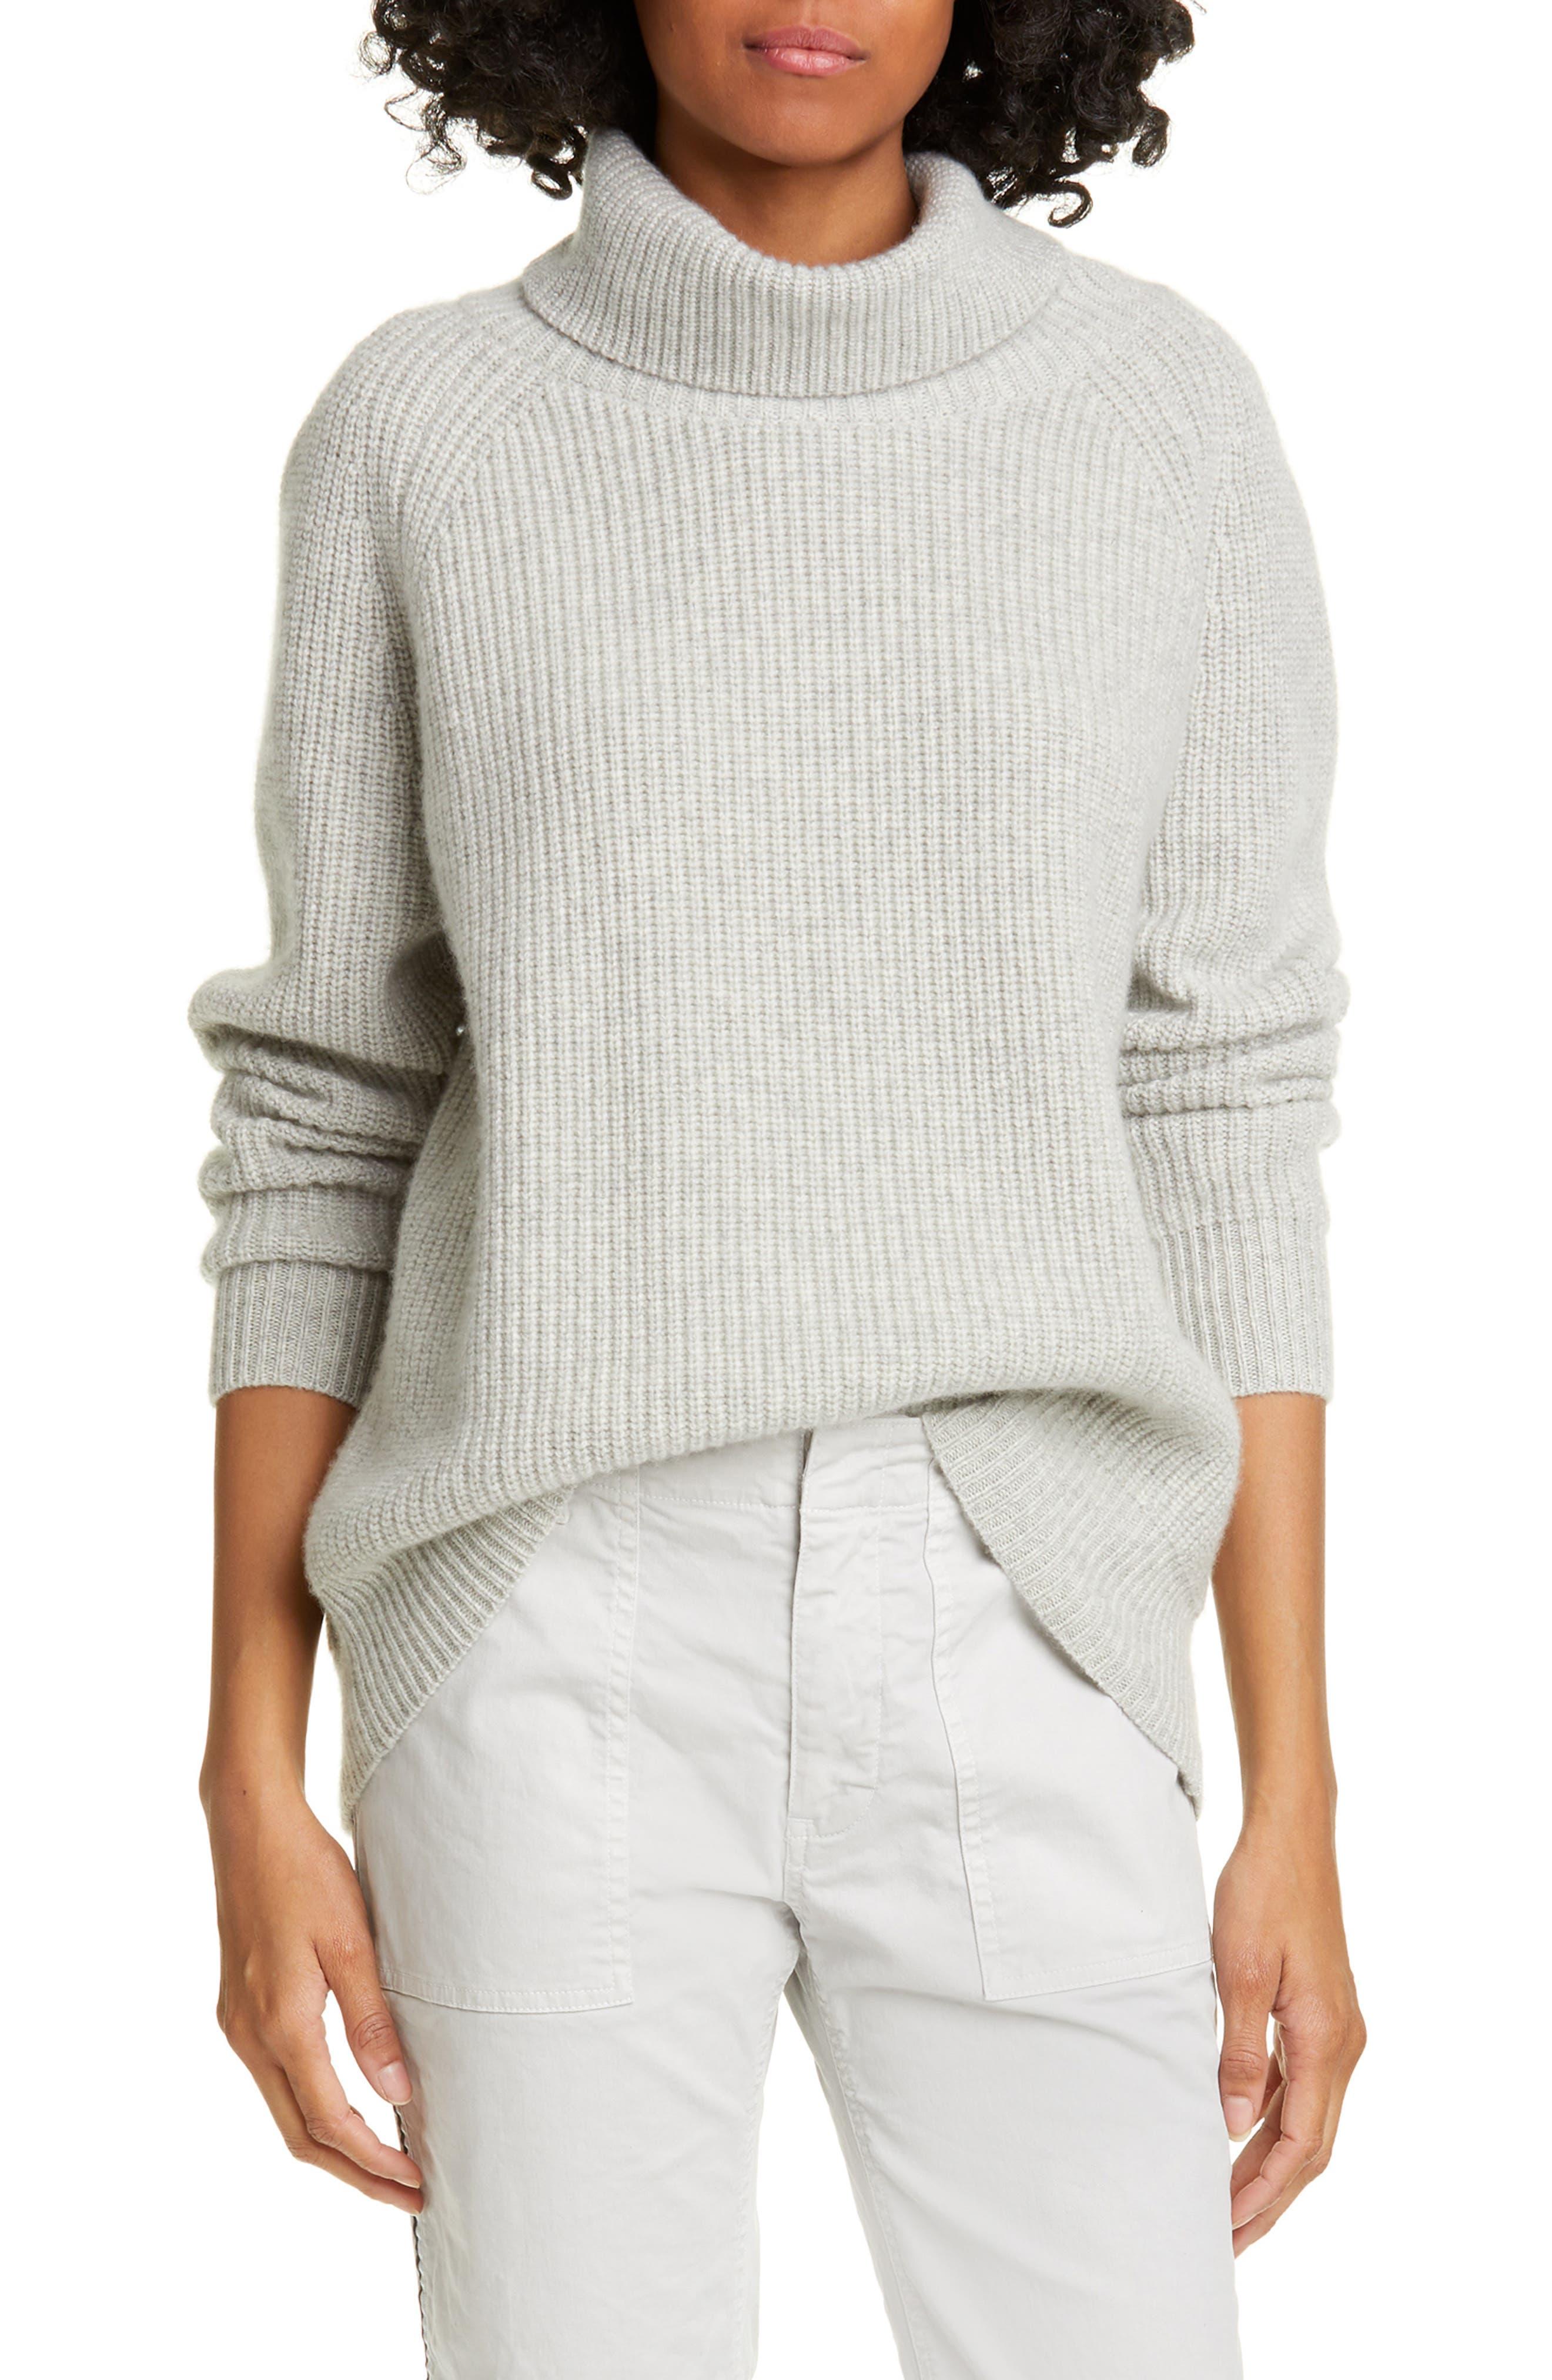 Nili Lotan Shayna Cashmere Turtleneck Sweater